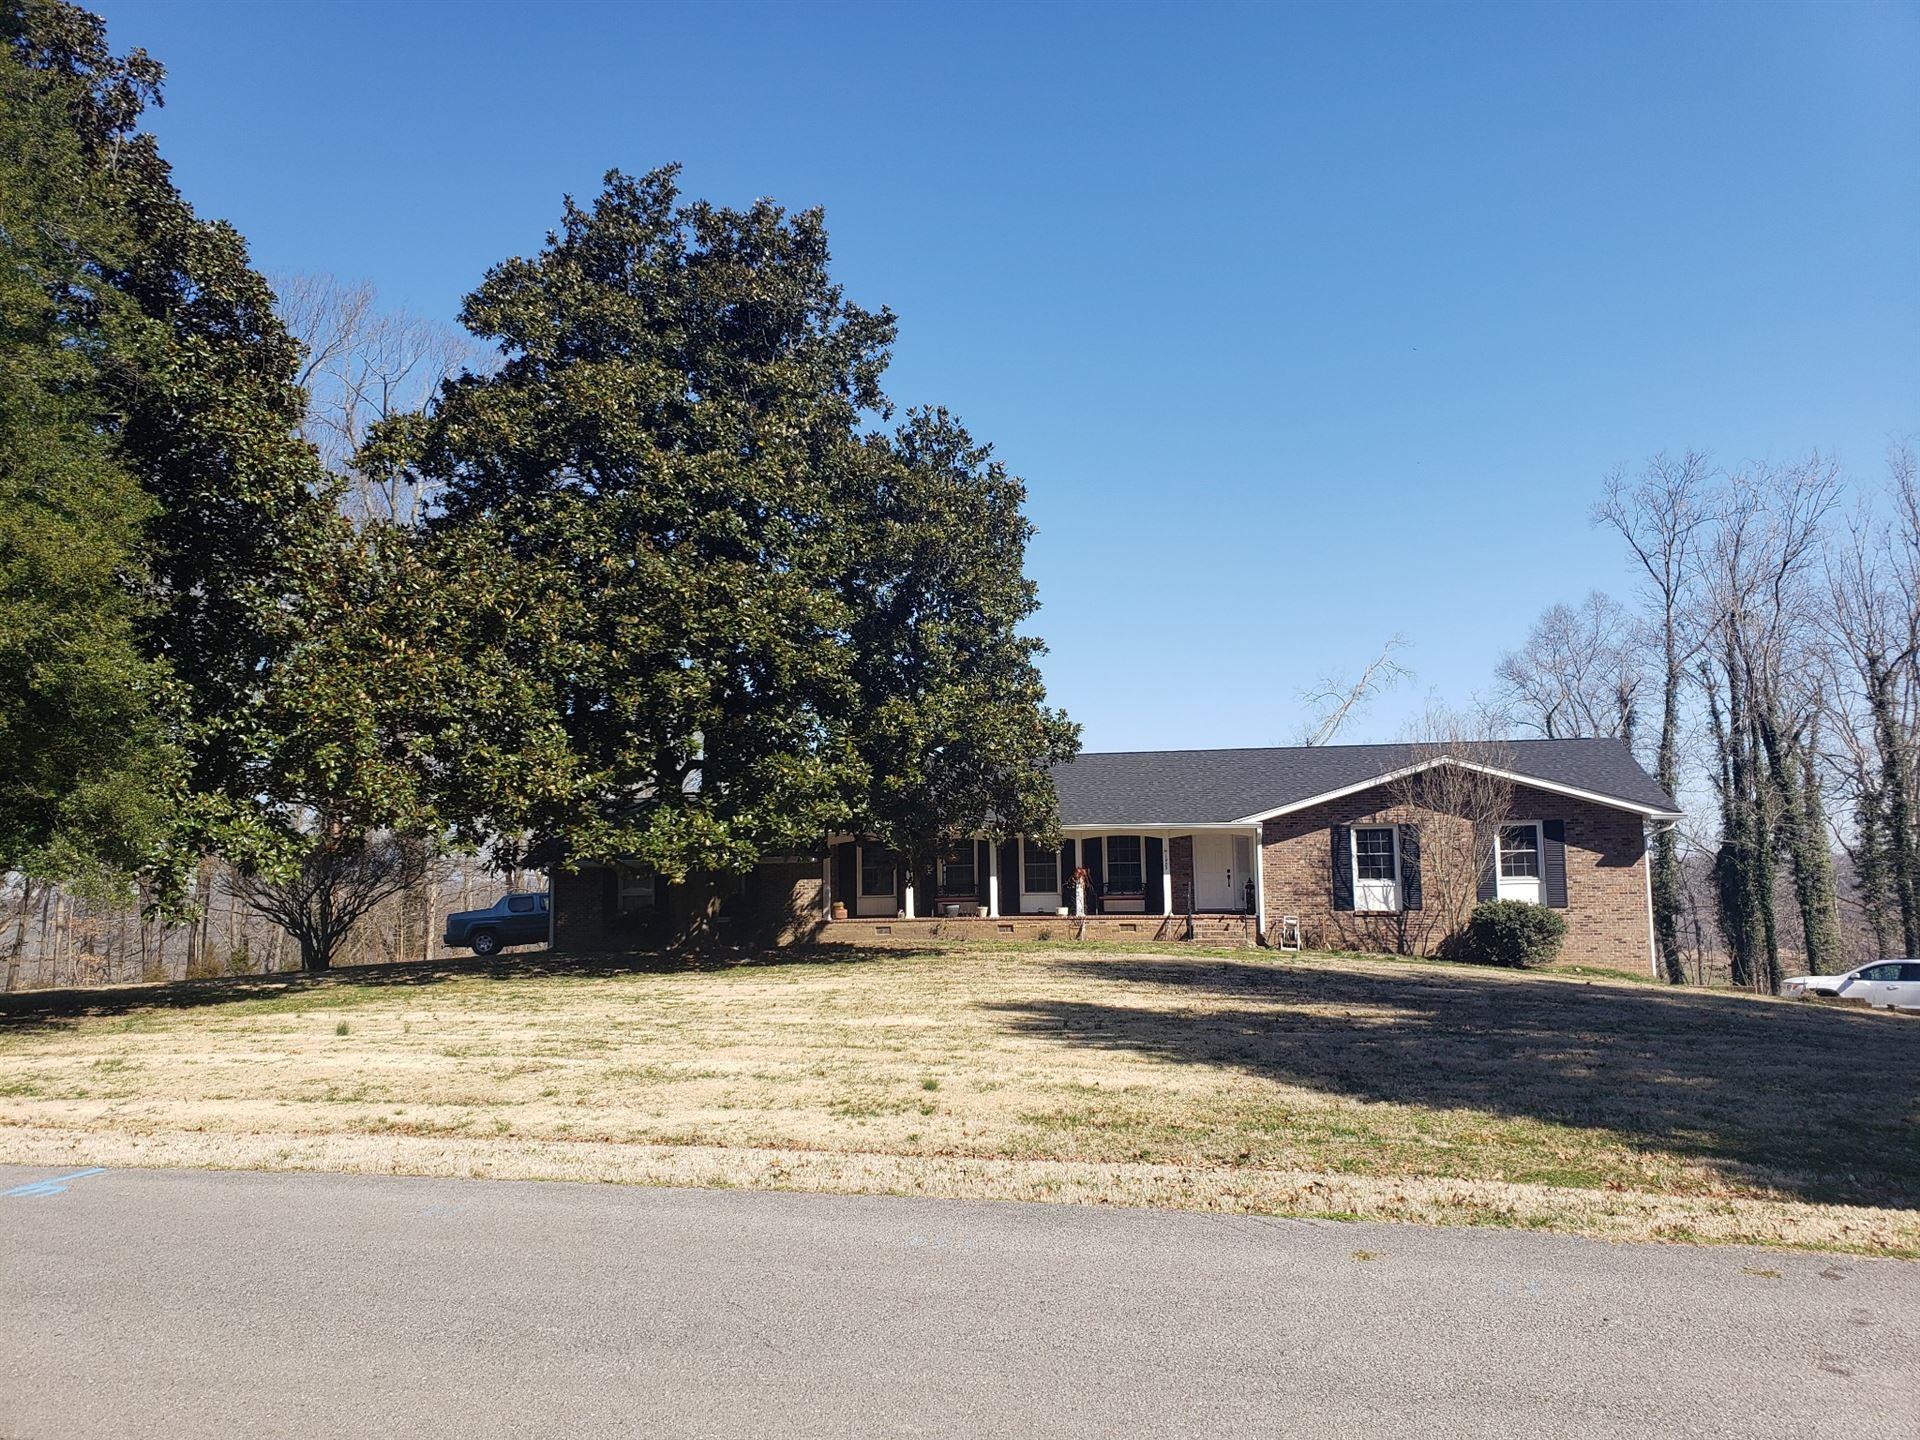 1983 Norwood Trl, Clarksville, TN 37043 - MLS#: 2233466